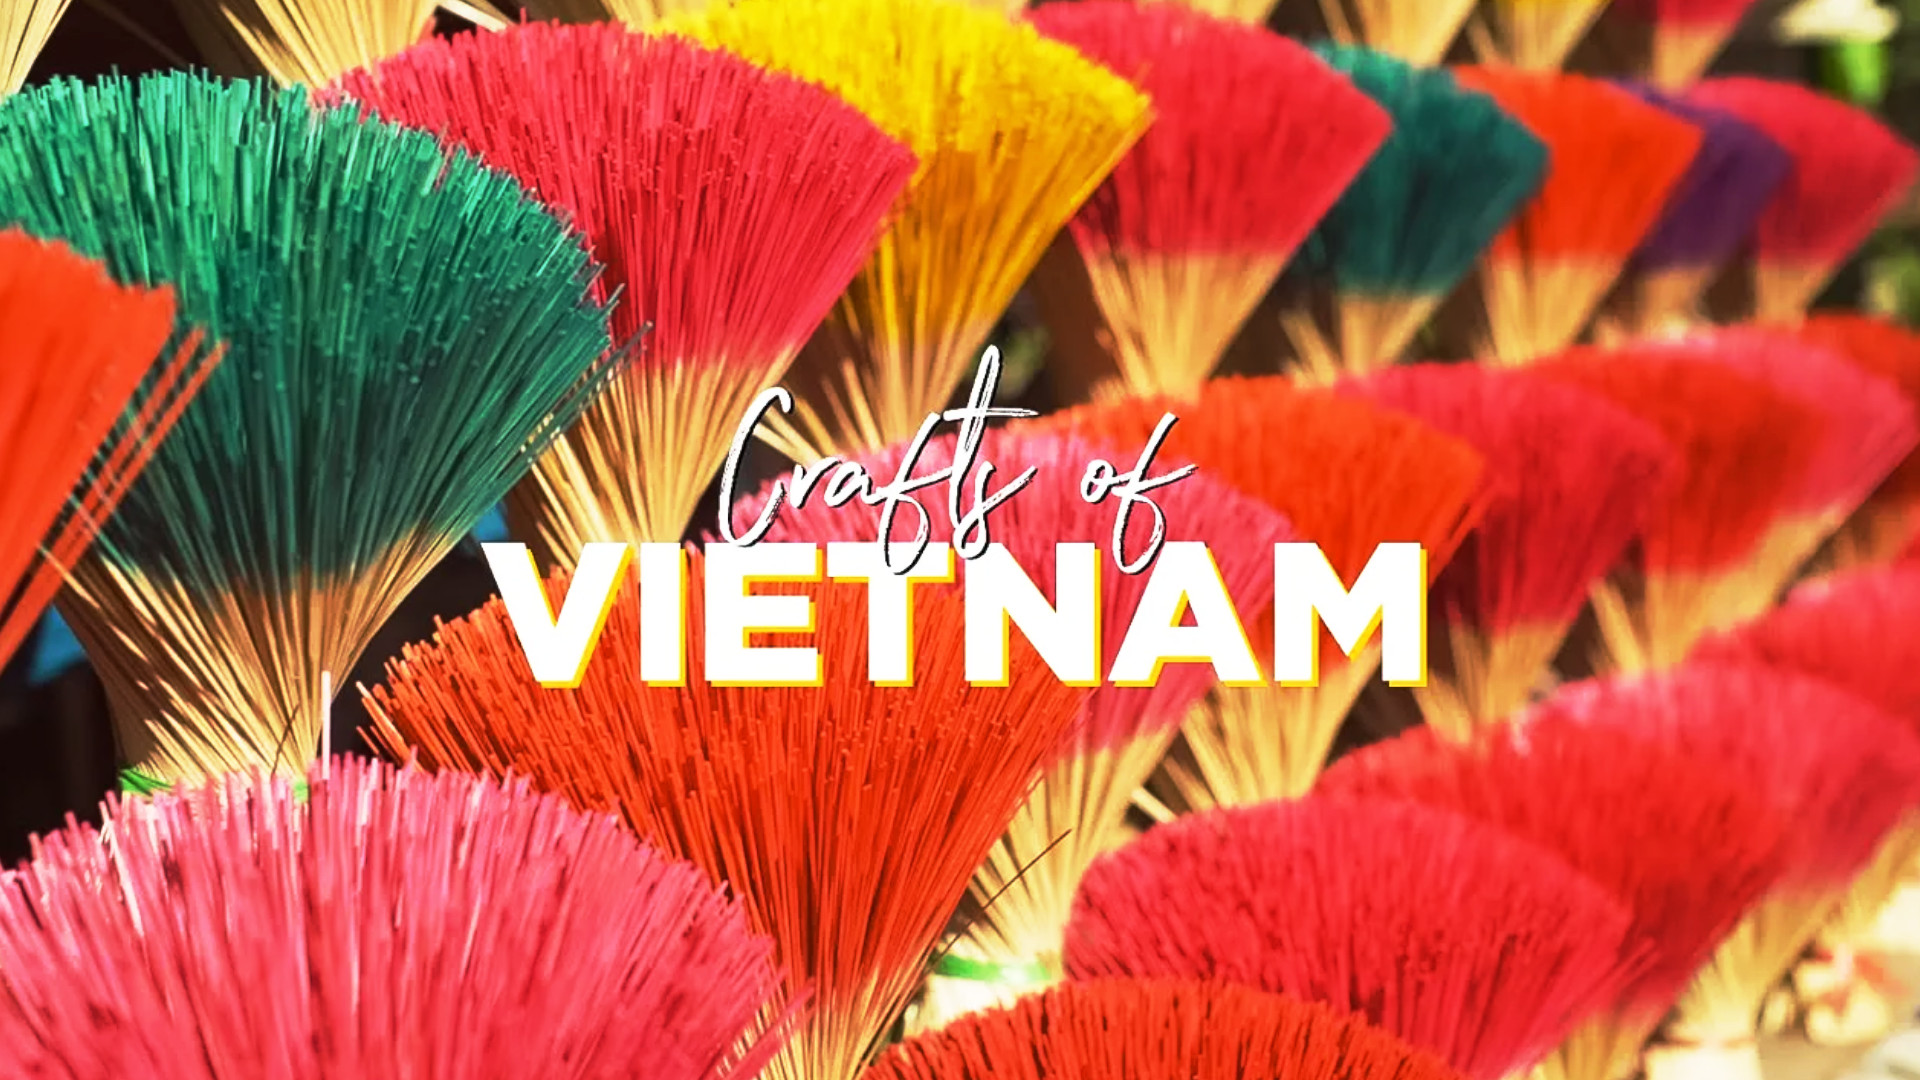 Crafts of Vietnam Tourism Campaign